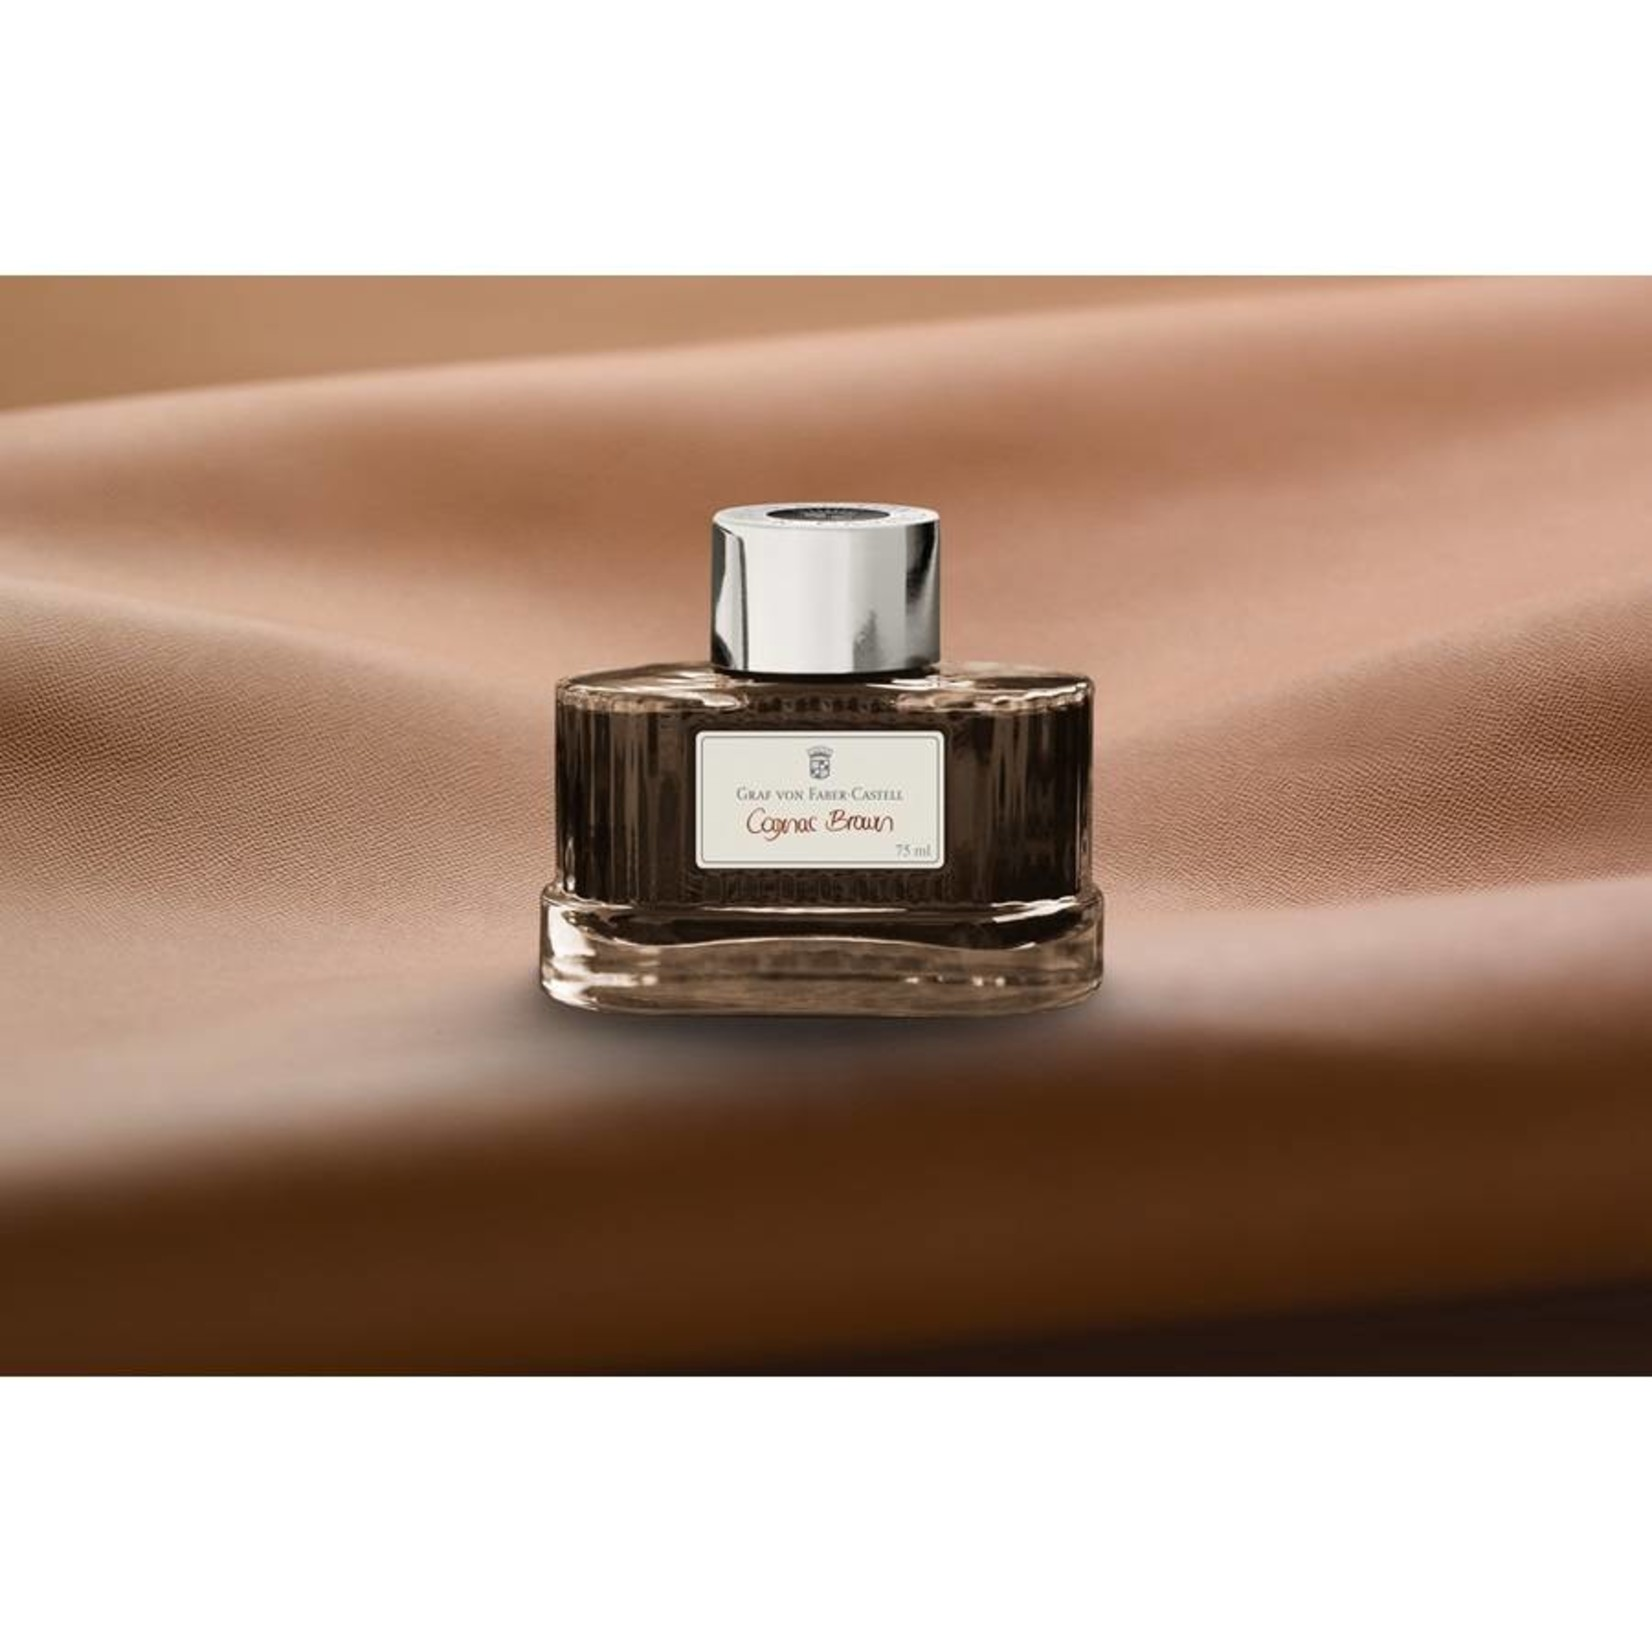 Faber-Castell GvFC Tintenglas 75ml Cognac brown